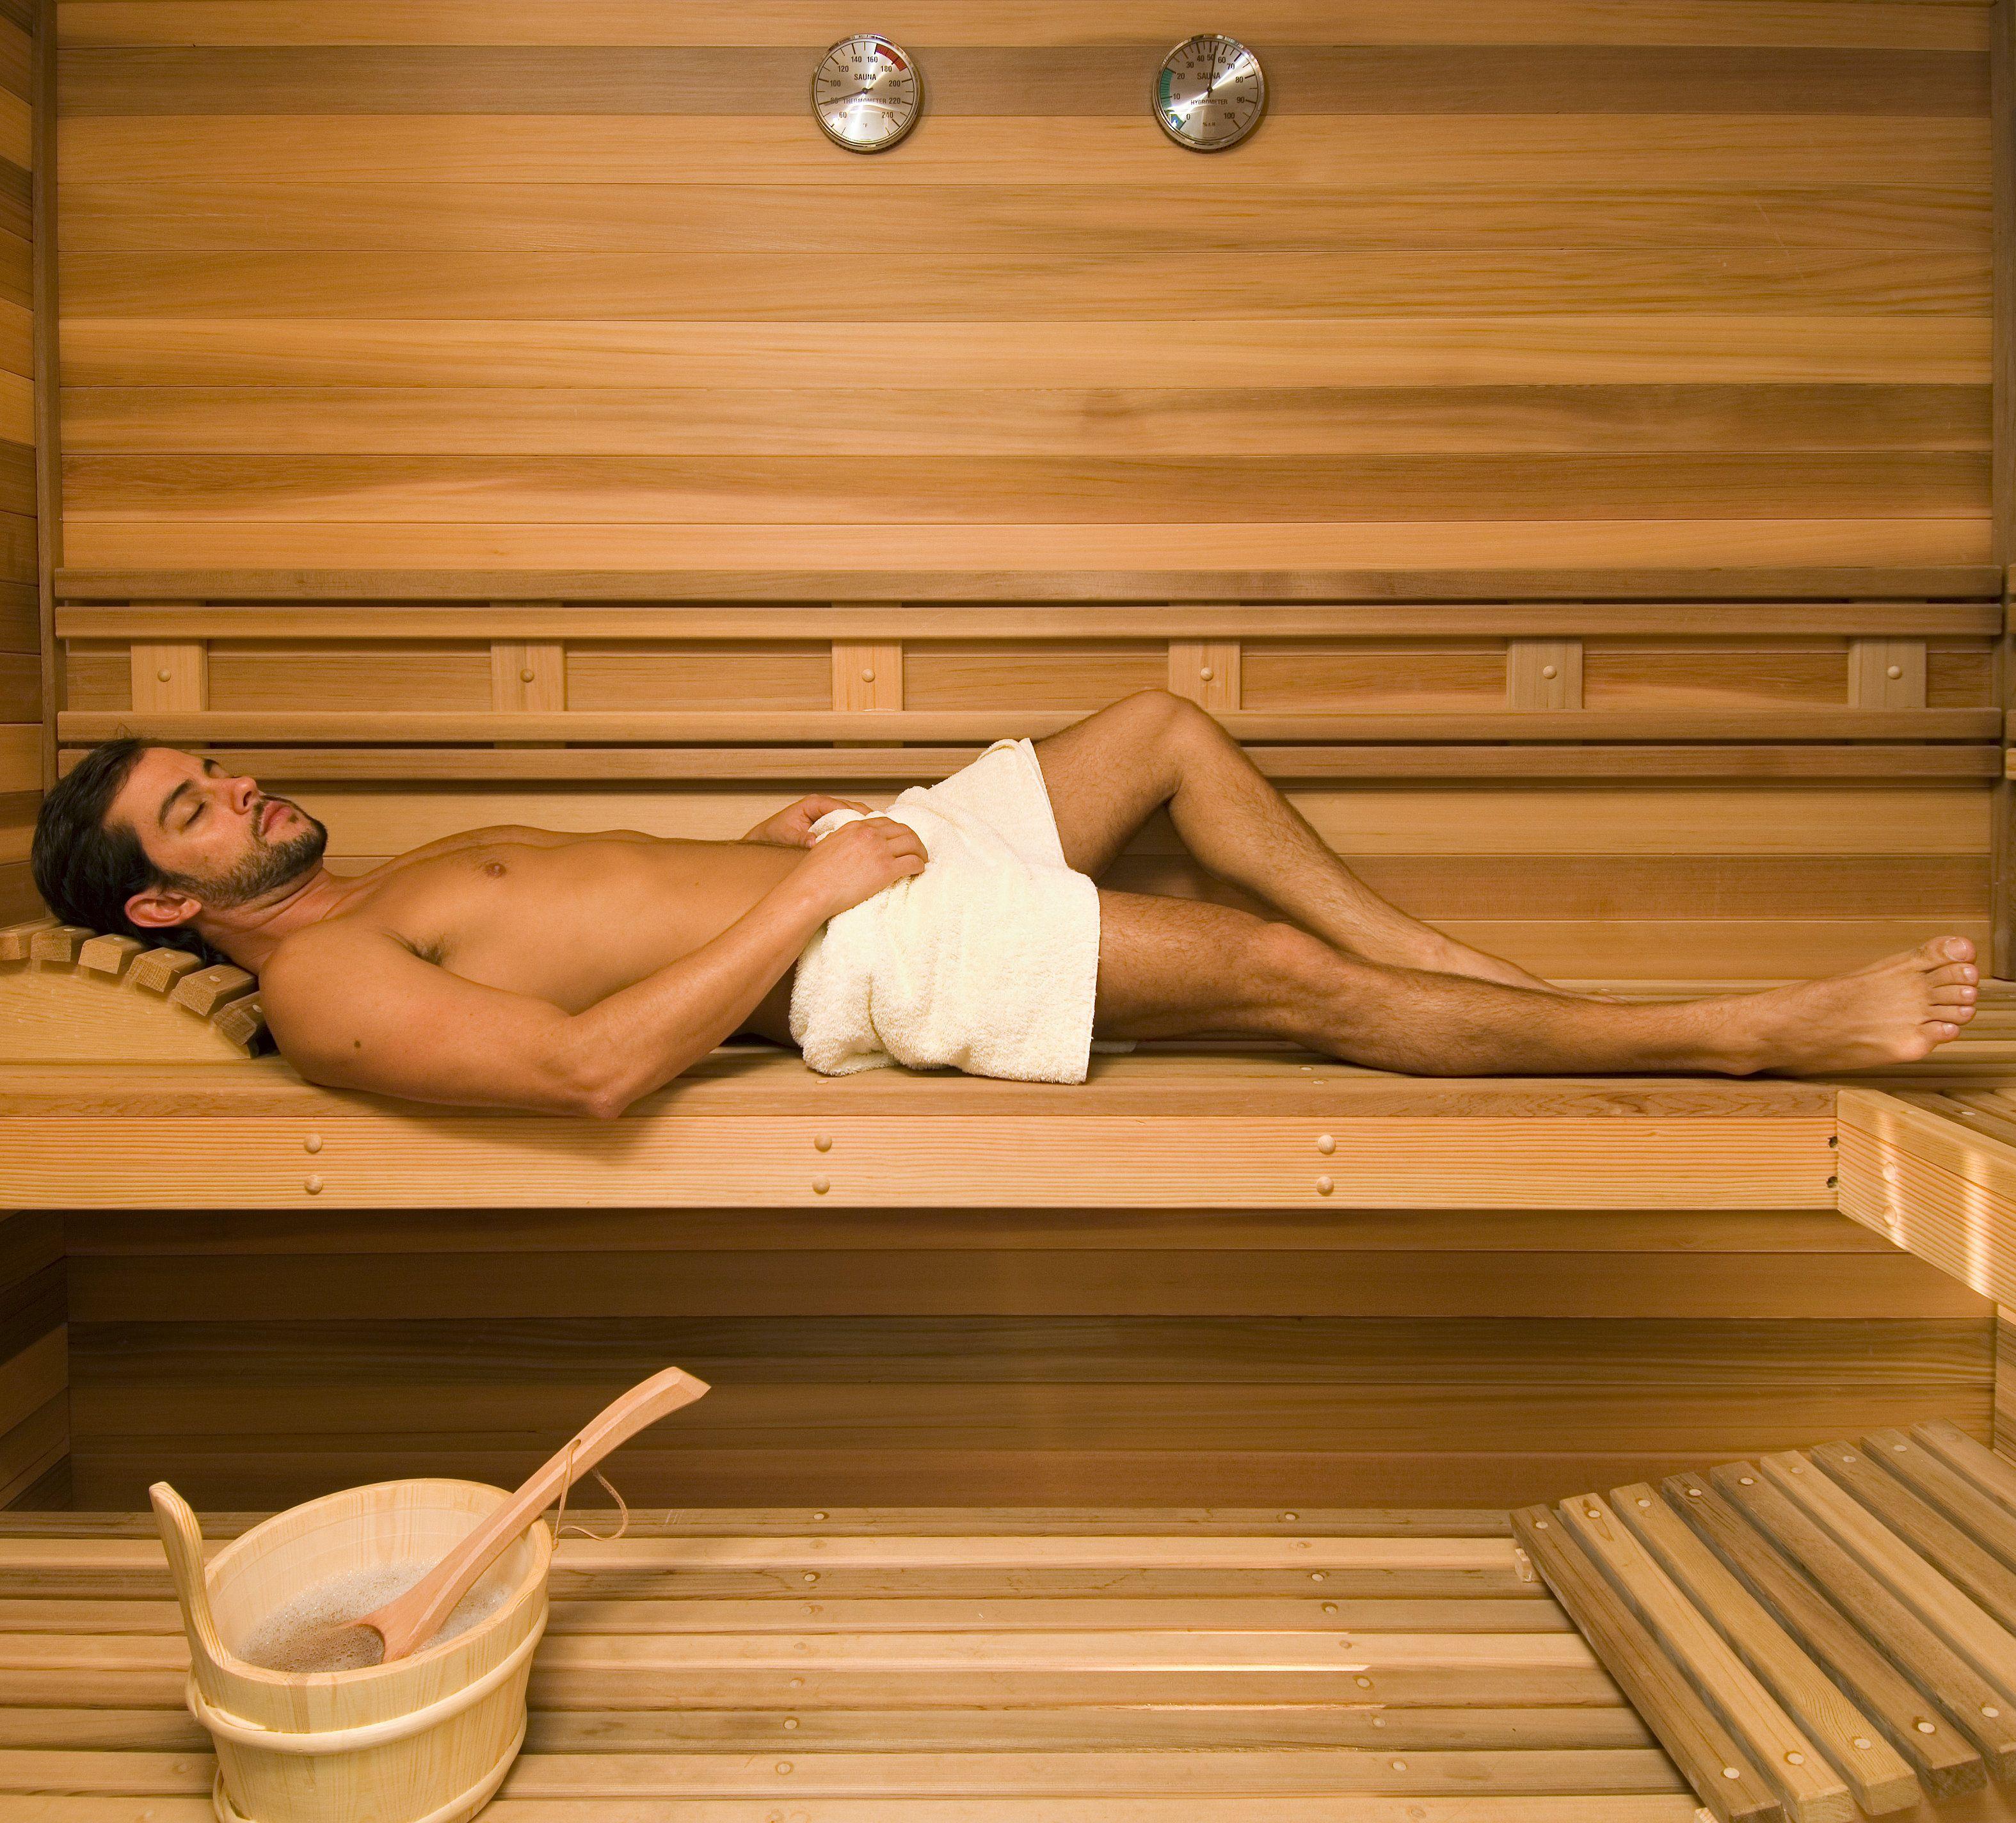 Luxury-sauna-vucutgelisimine-faydasi1